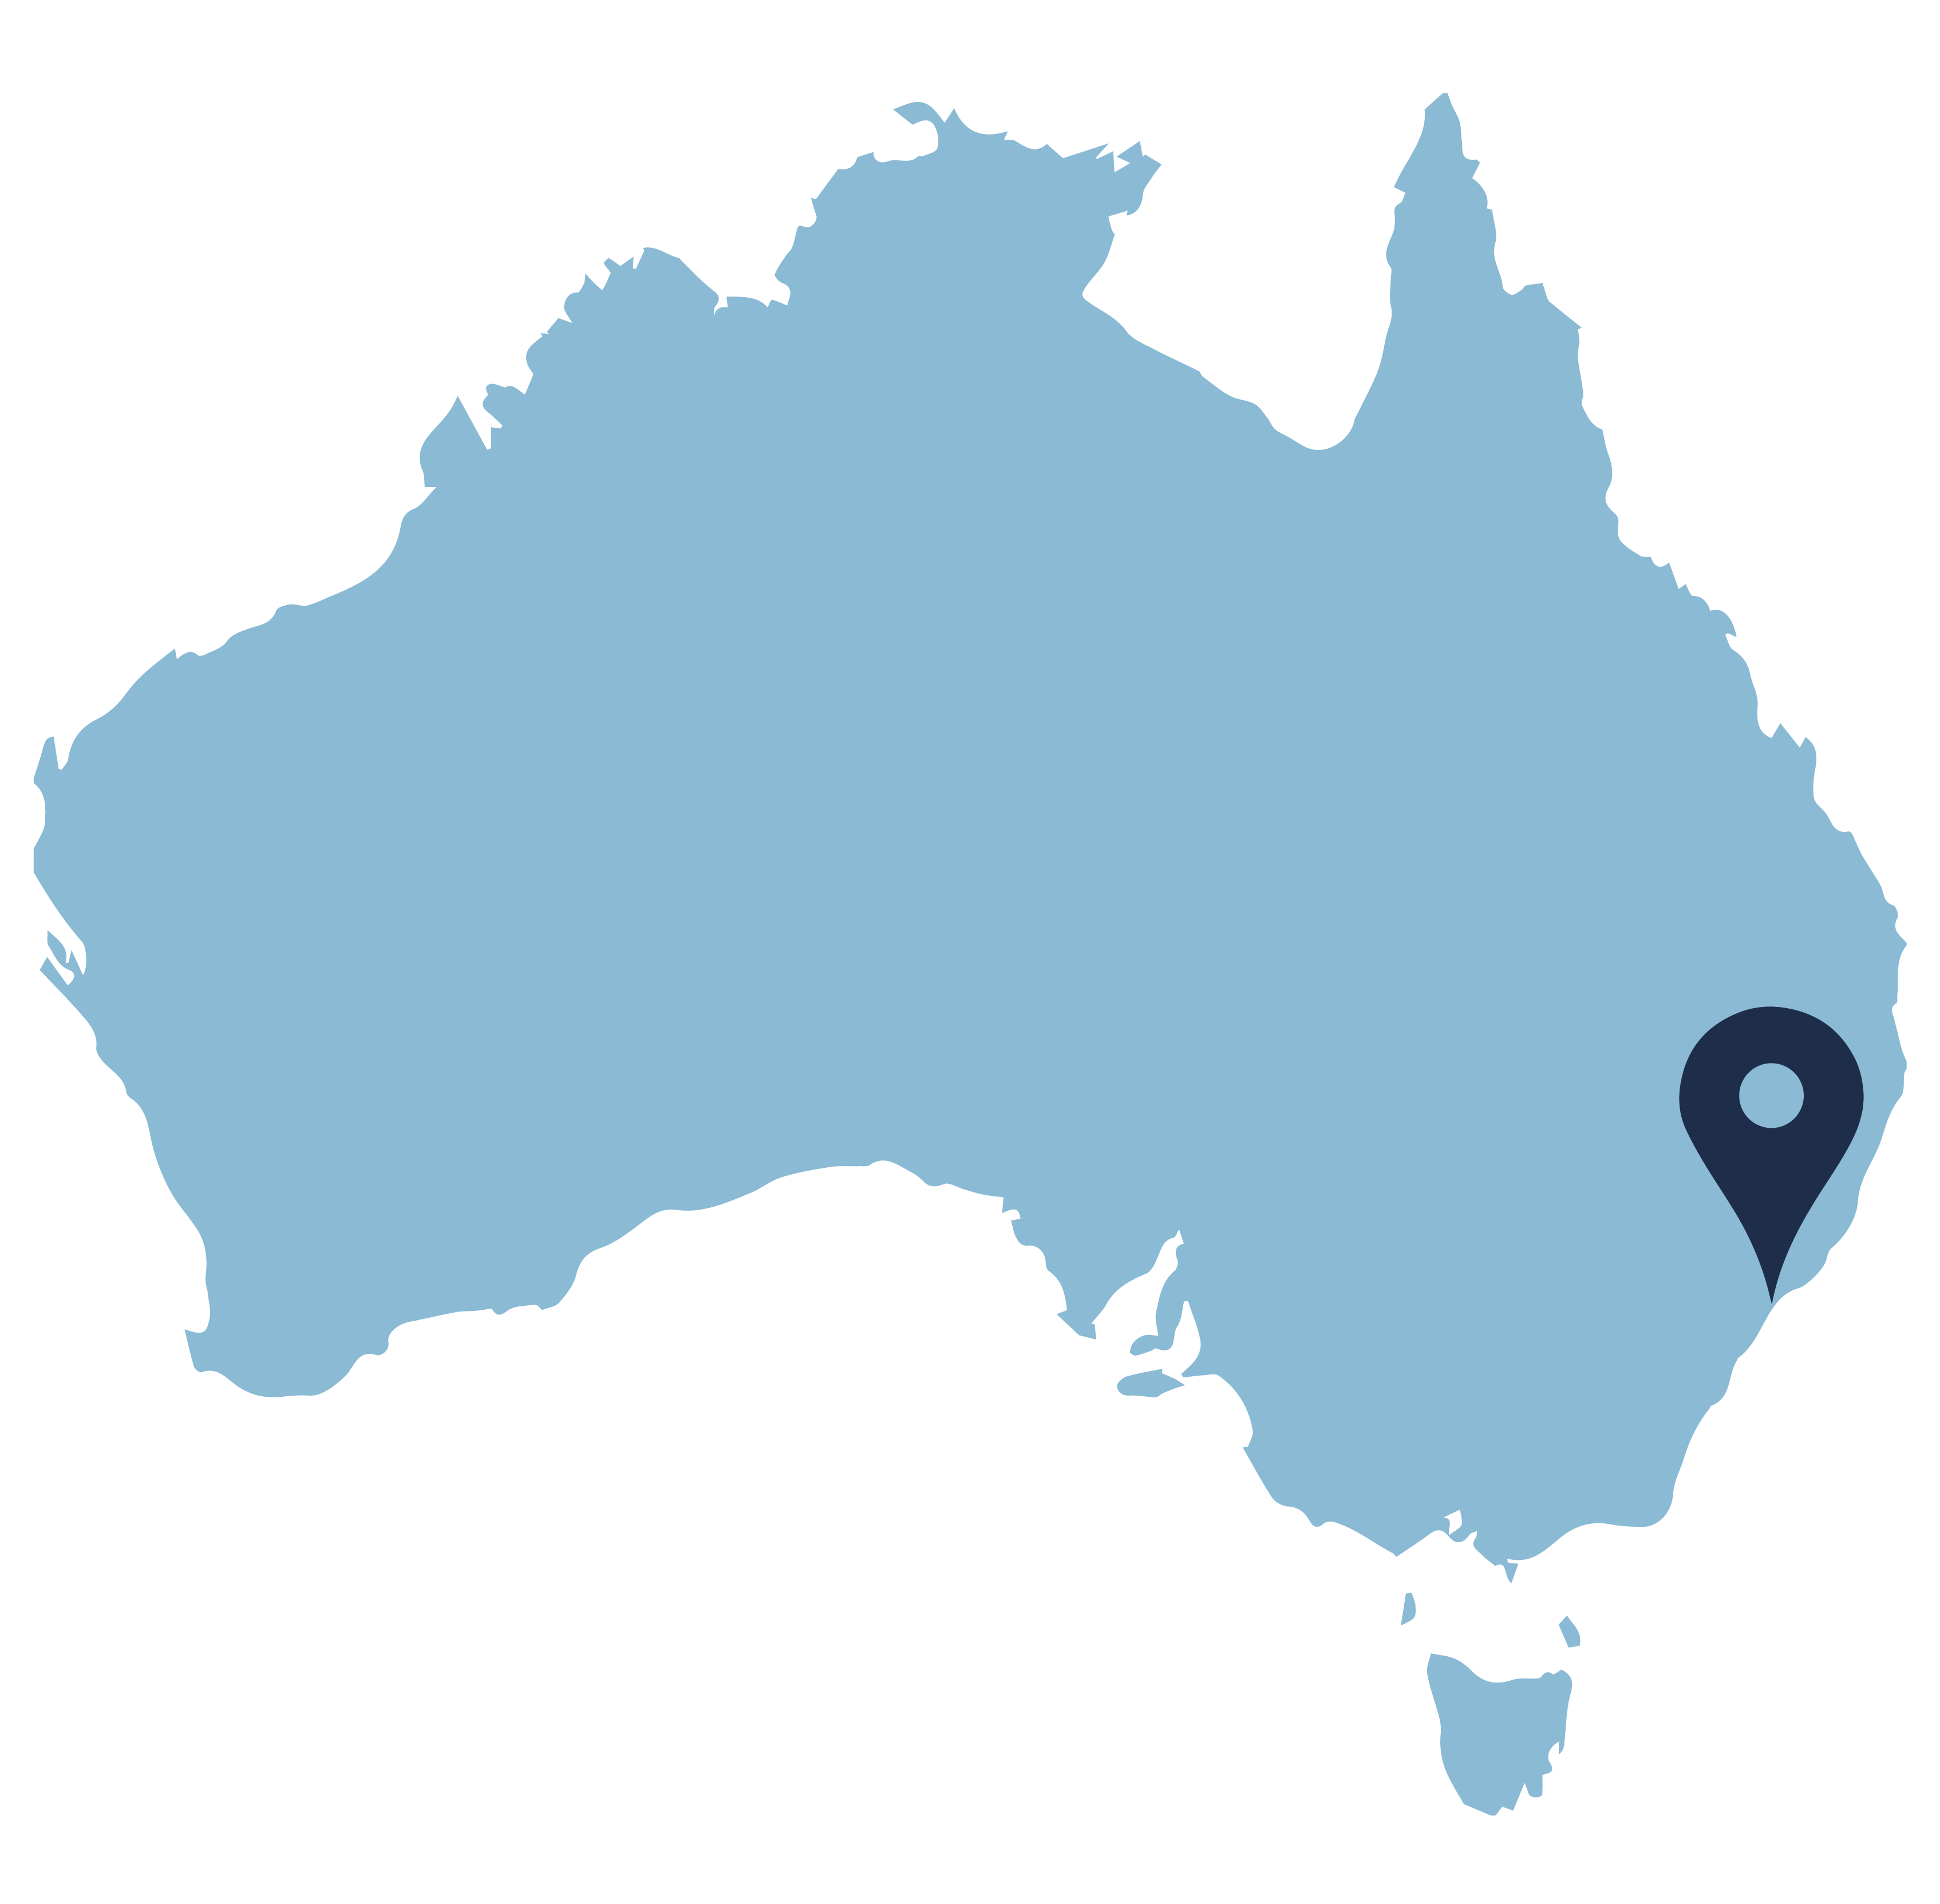 https://lgenestateplan.com/wp-content/uploads/2021/08/Australia-Footer-04.png